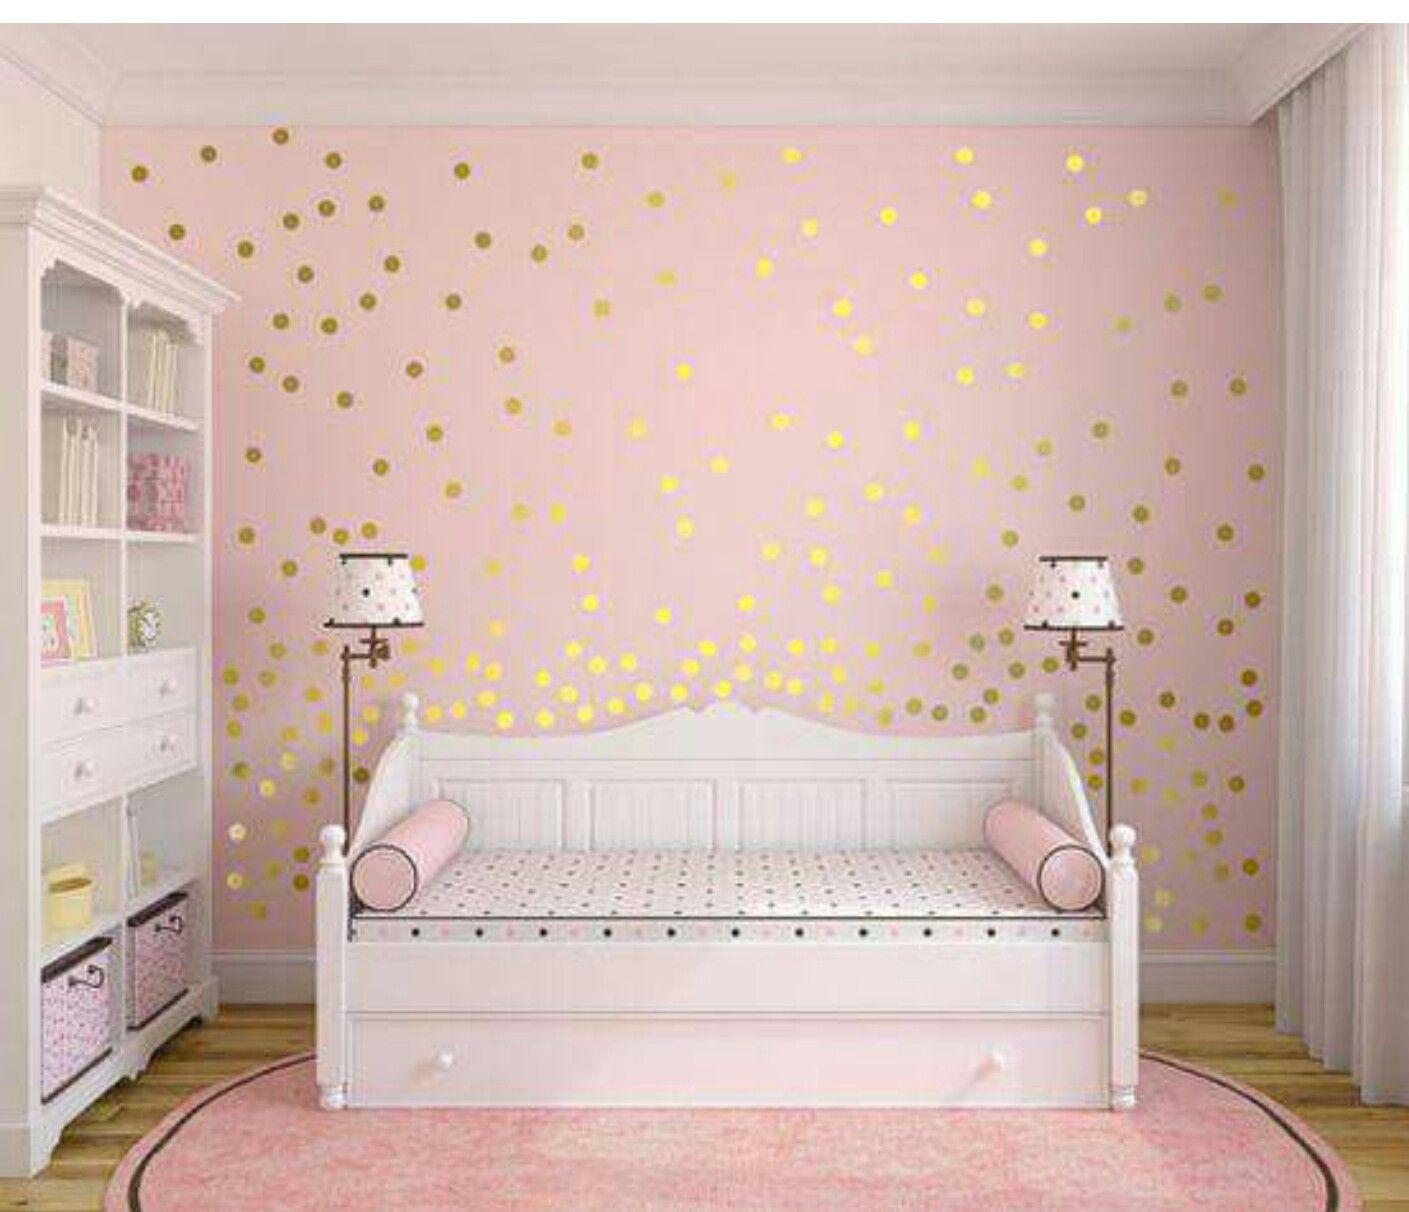 Golden Dots Girl Room Gold Wall Decals Polka Dot Wall Decor